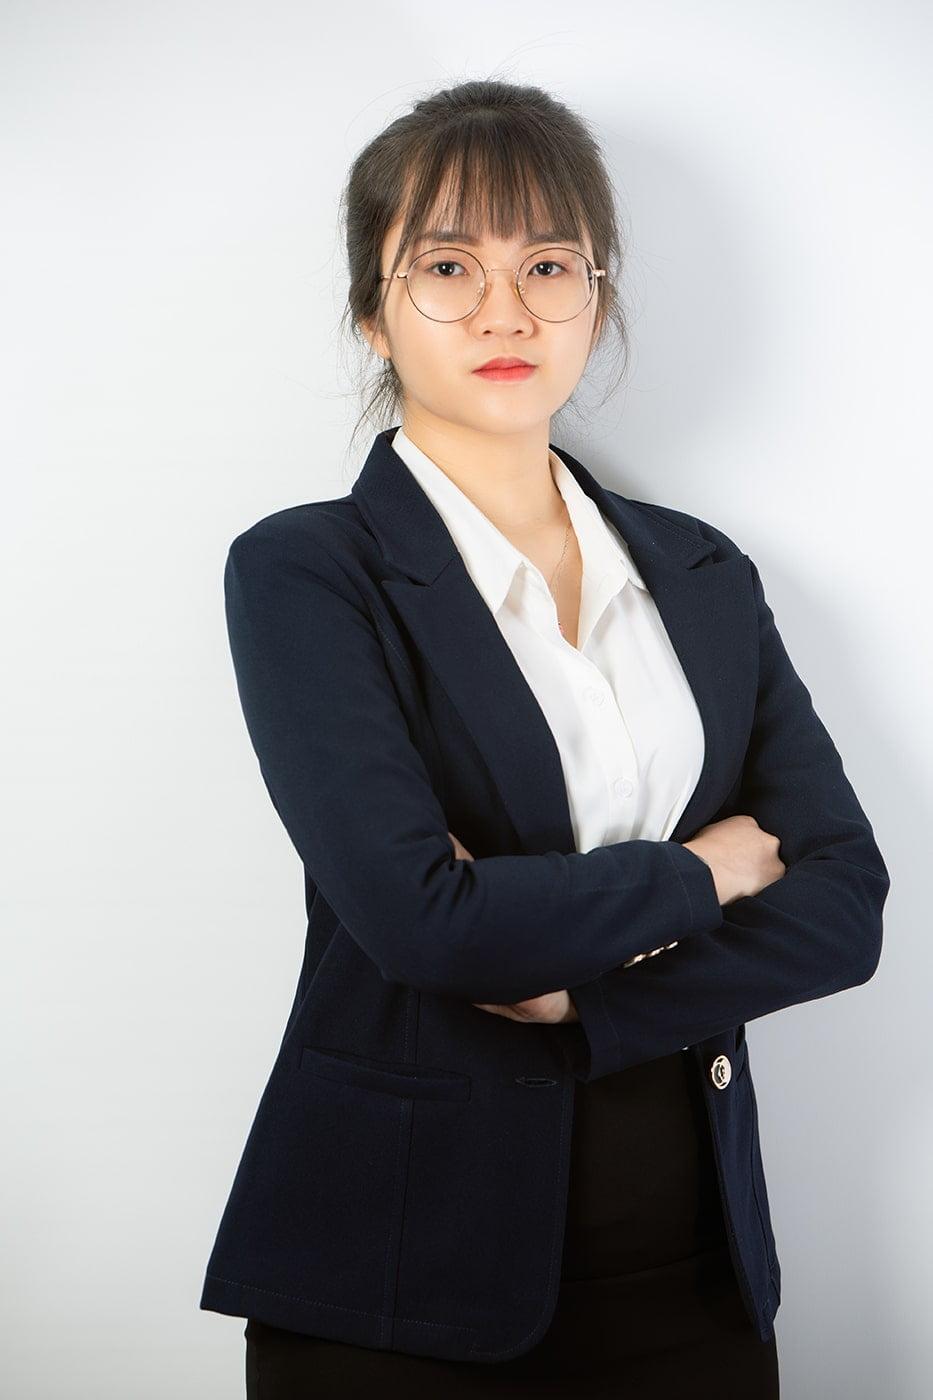 Profile cong ty 14 - Album chụp ảnh profile công ty Luật Dzungsrt Law - HThao Studio